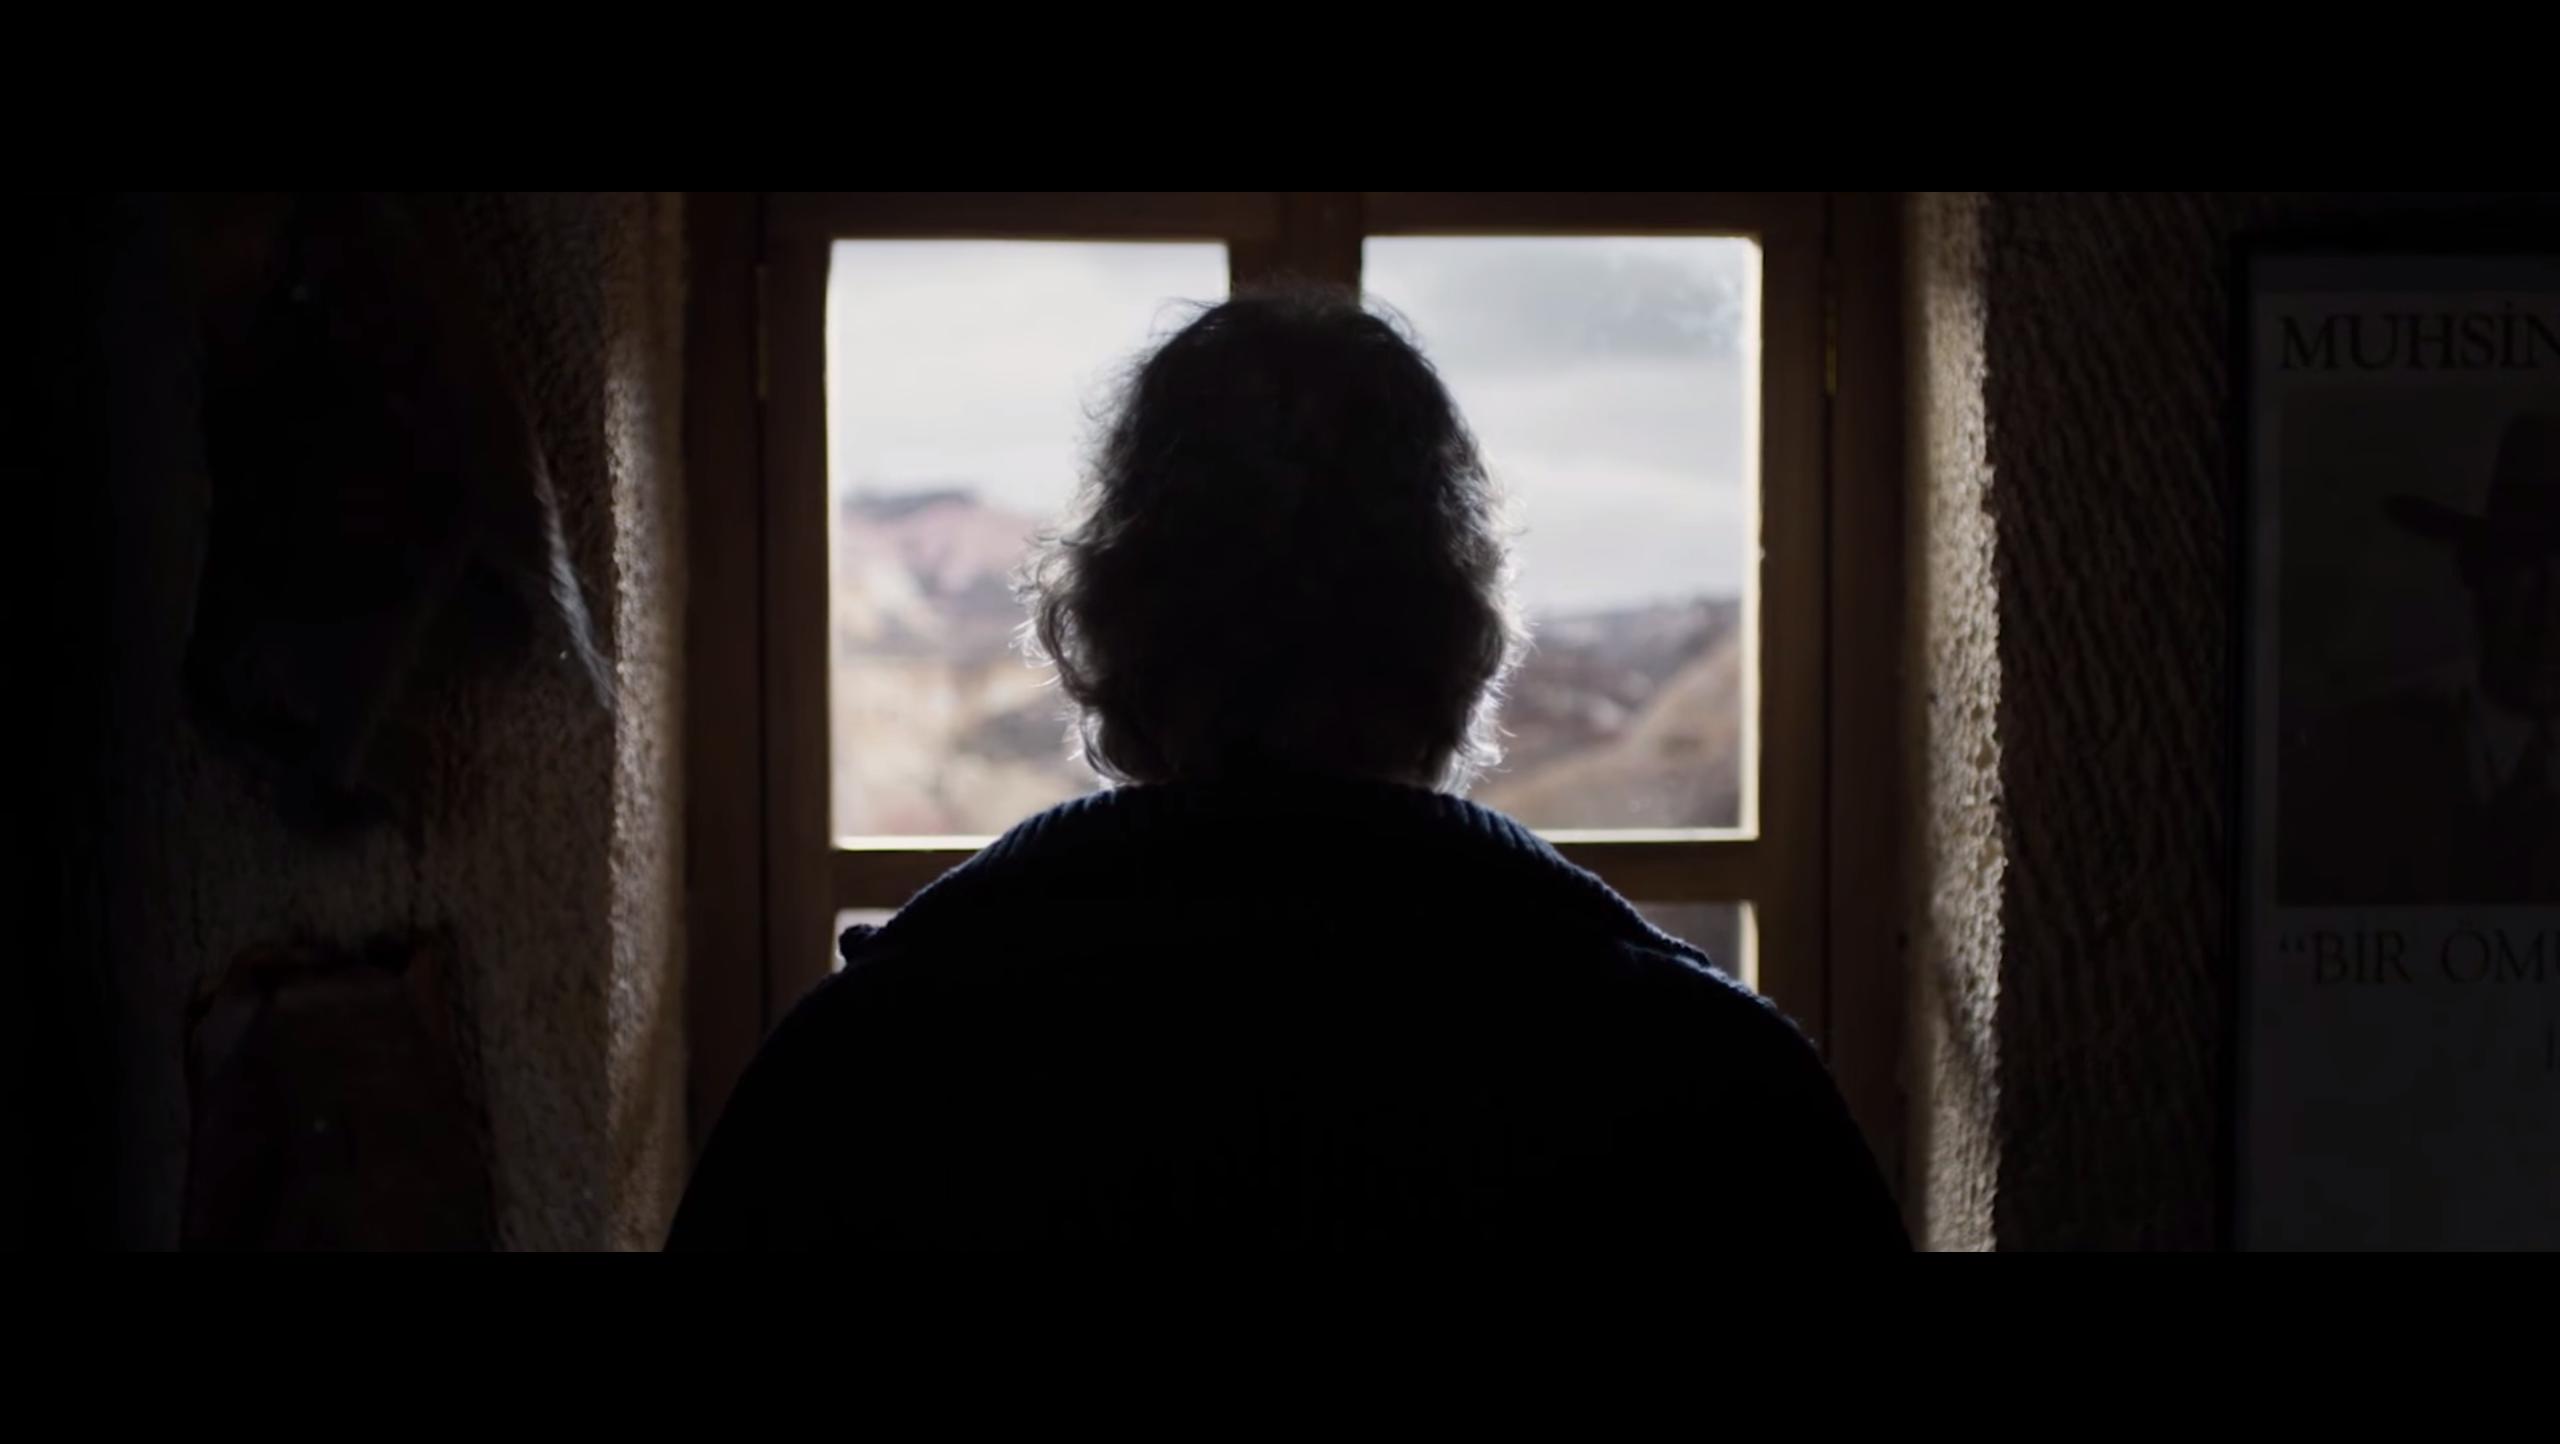 winterschlaf-film-screenshot-04_renk